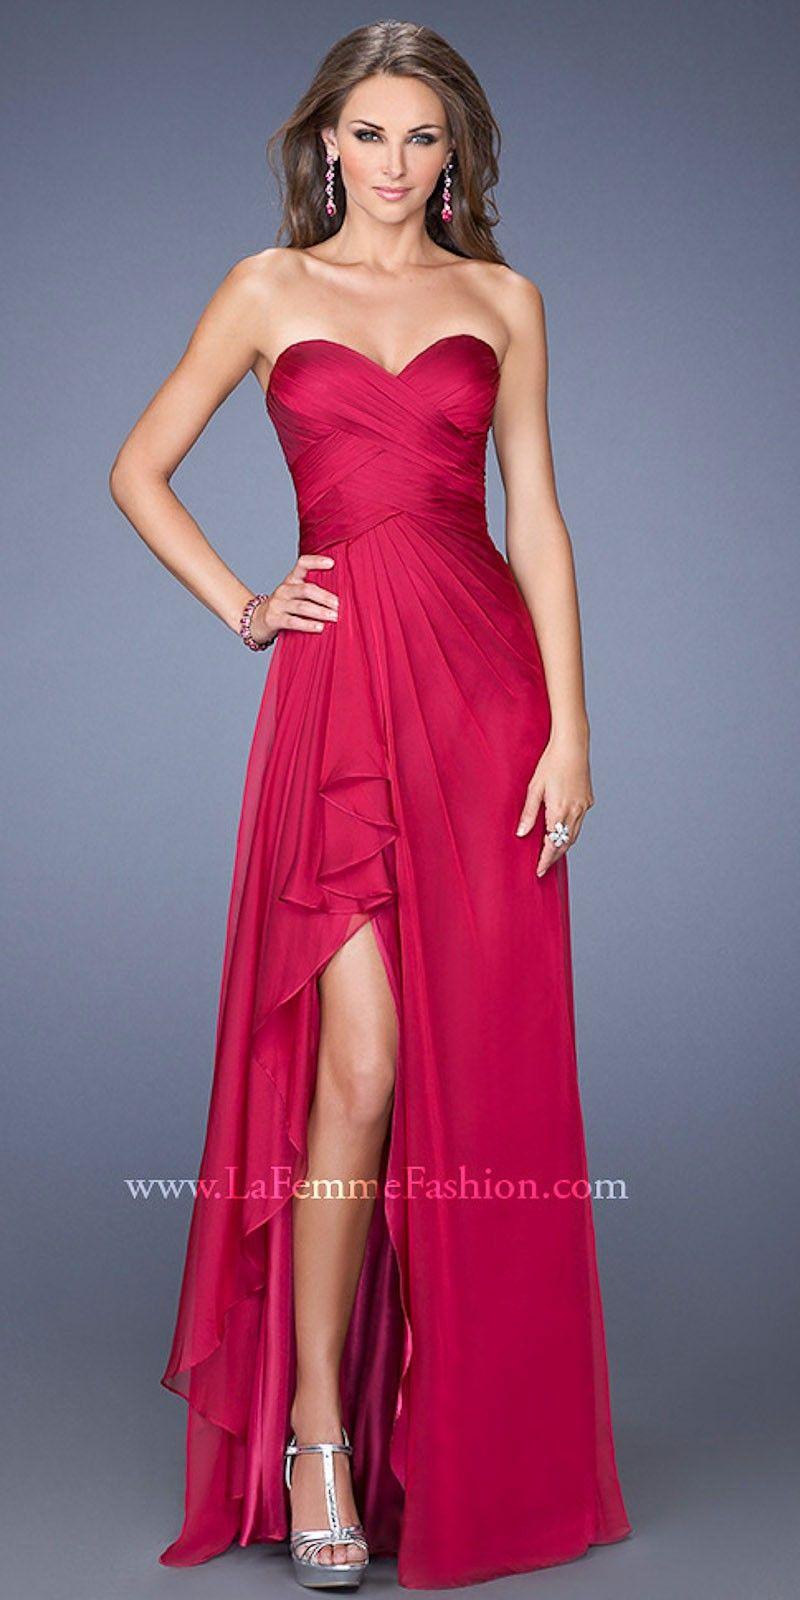 Crisscross sweetheart bodice leg slit prom dresses by la femme